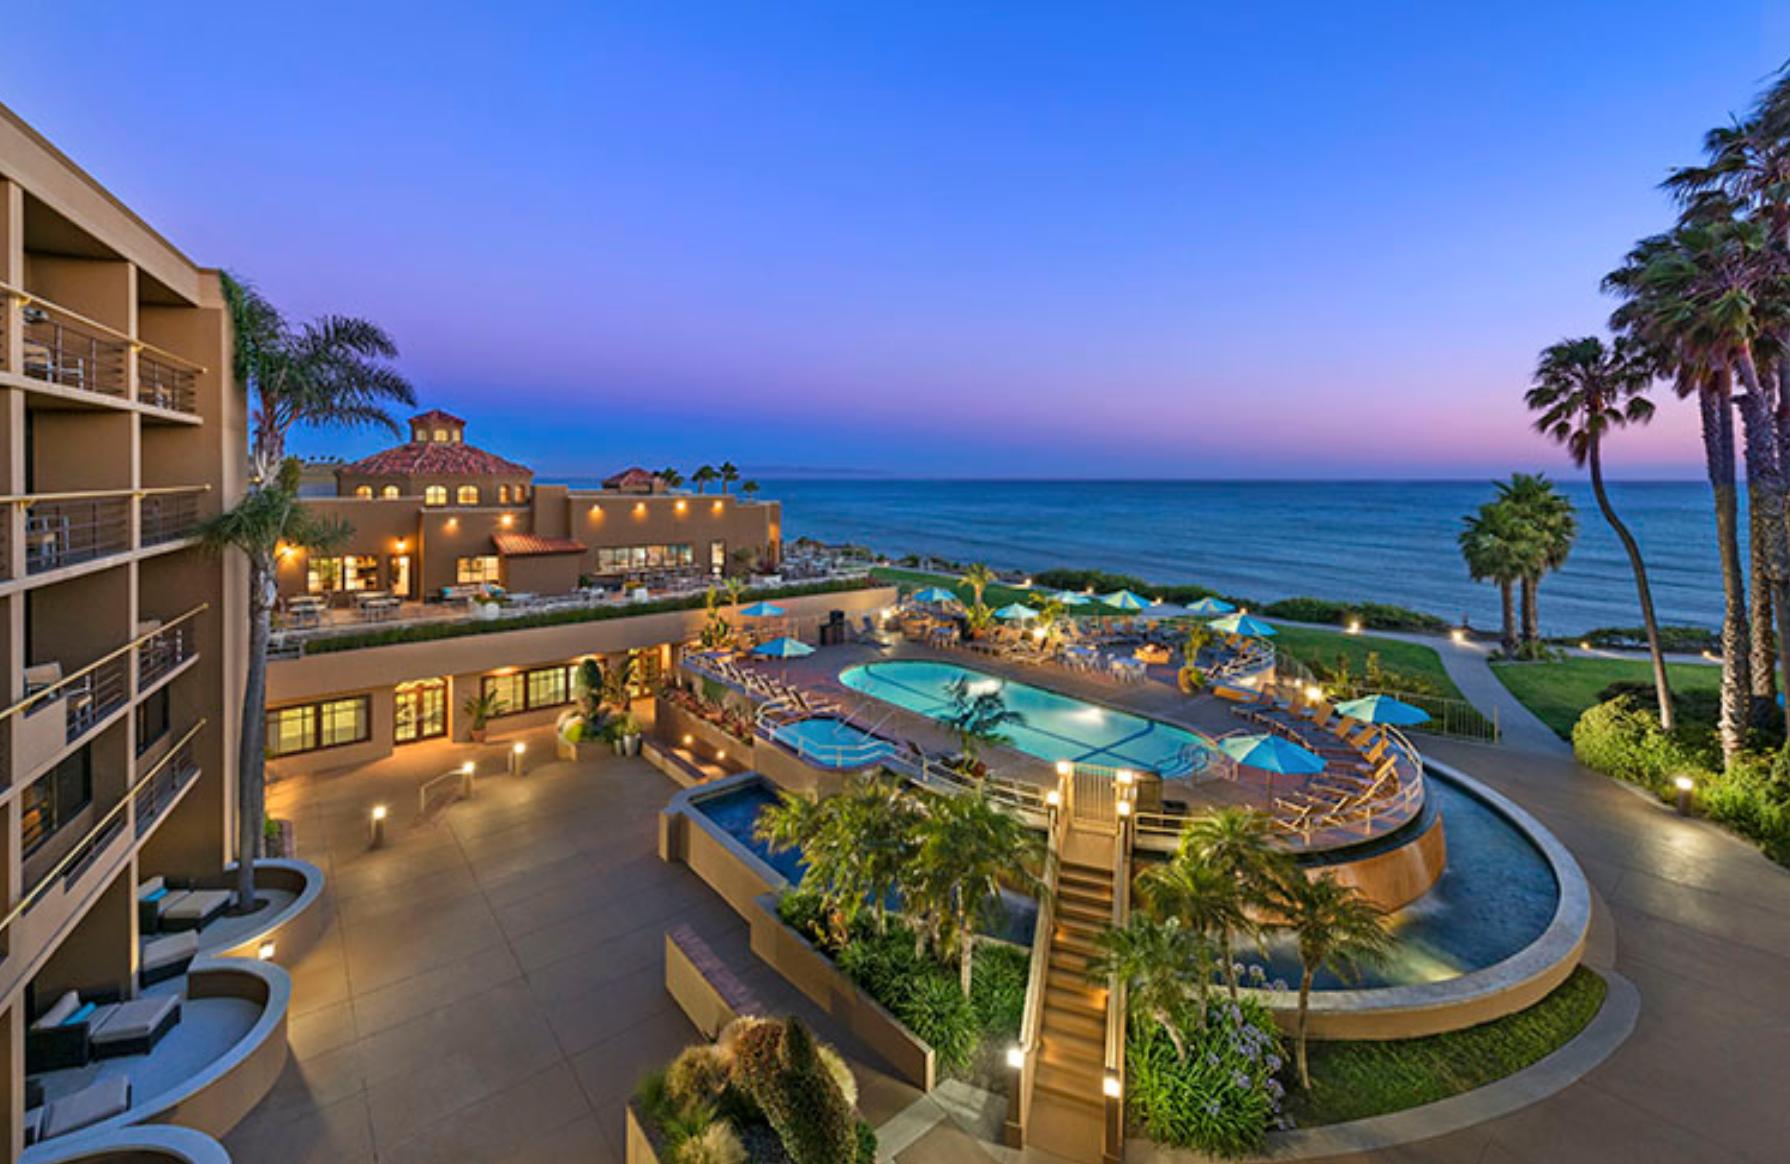 Generic hotel resort